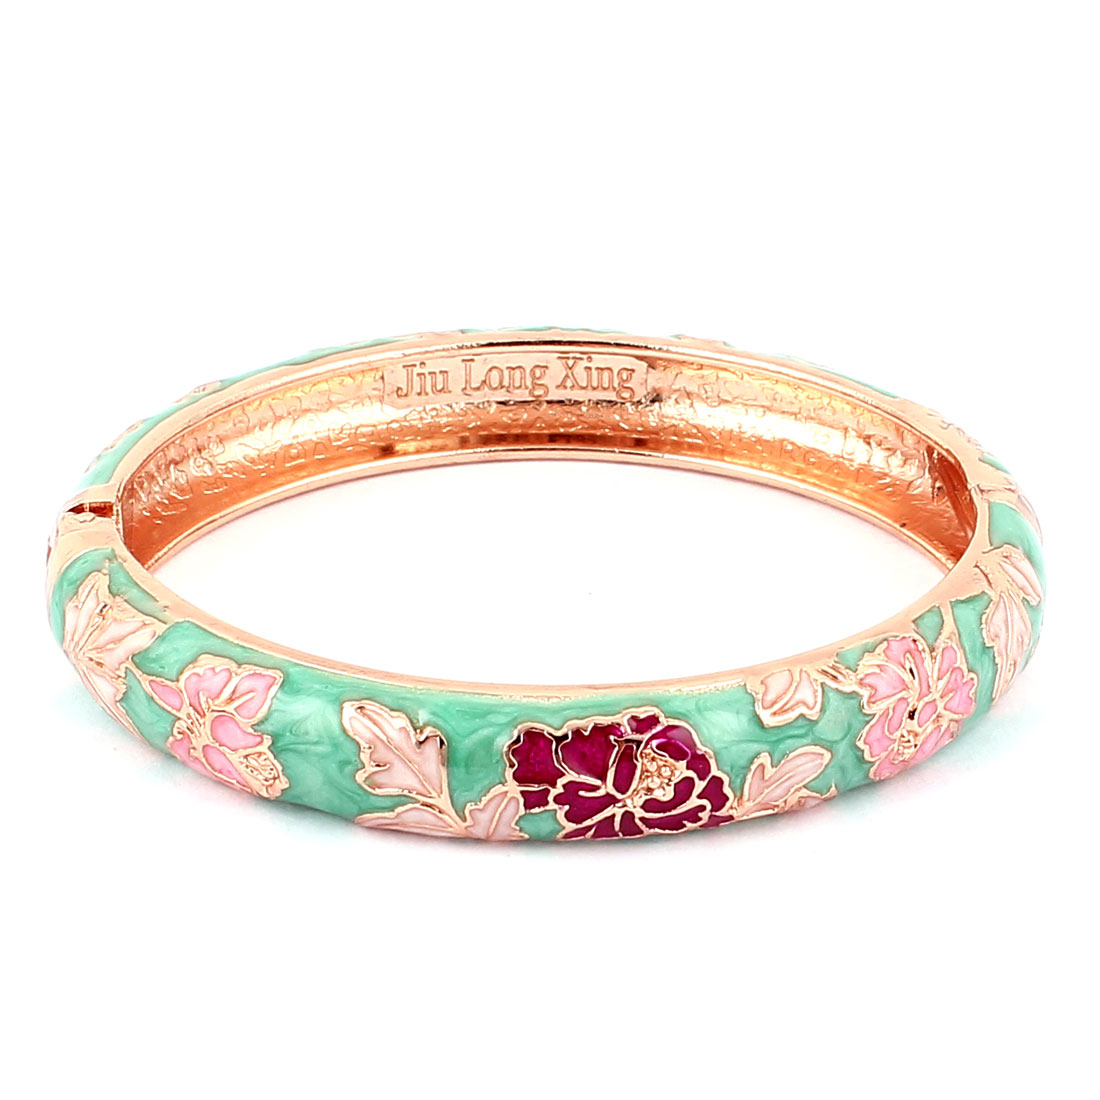 Lady Enamel Gold Plated Cuff Bangle Jewelry Bracelet Wedding Party Gift